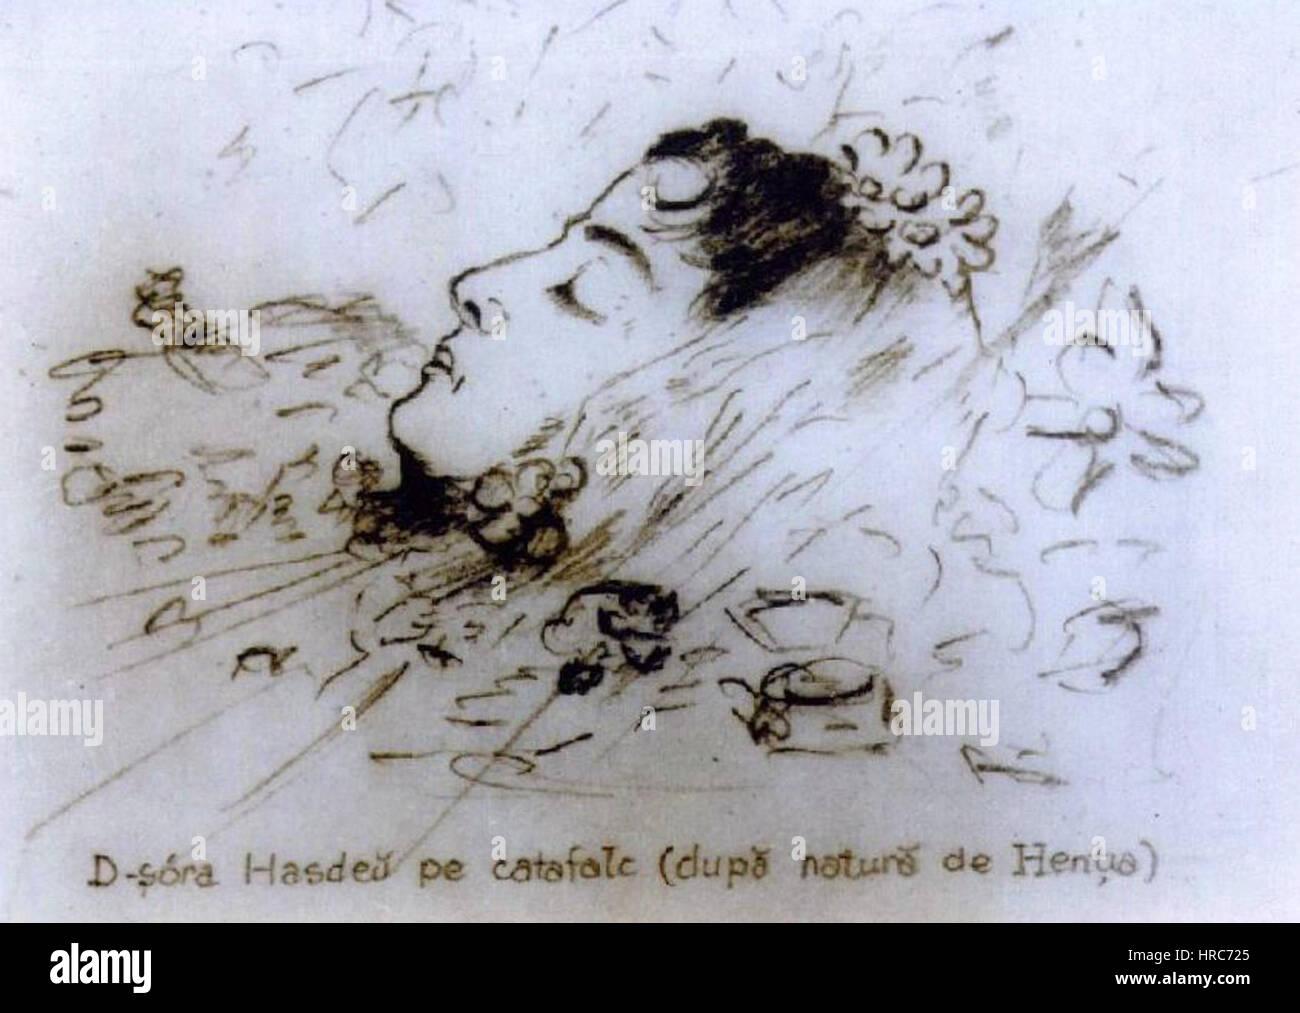 Hentia Pics throughout sava hentia - domnisoara hasdeu pe catafalc stock photo, royalty